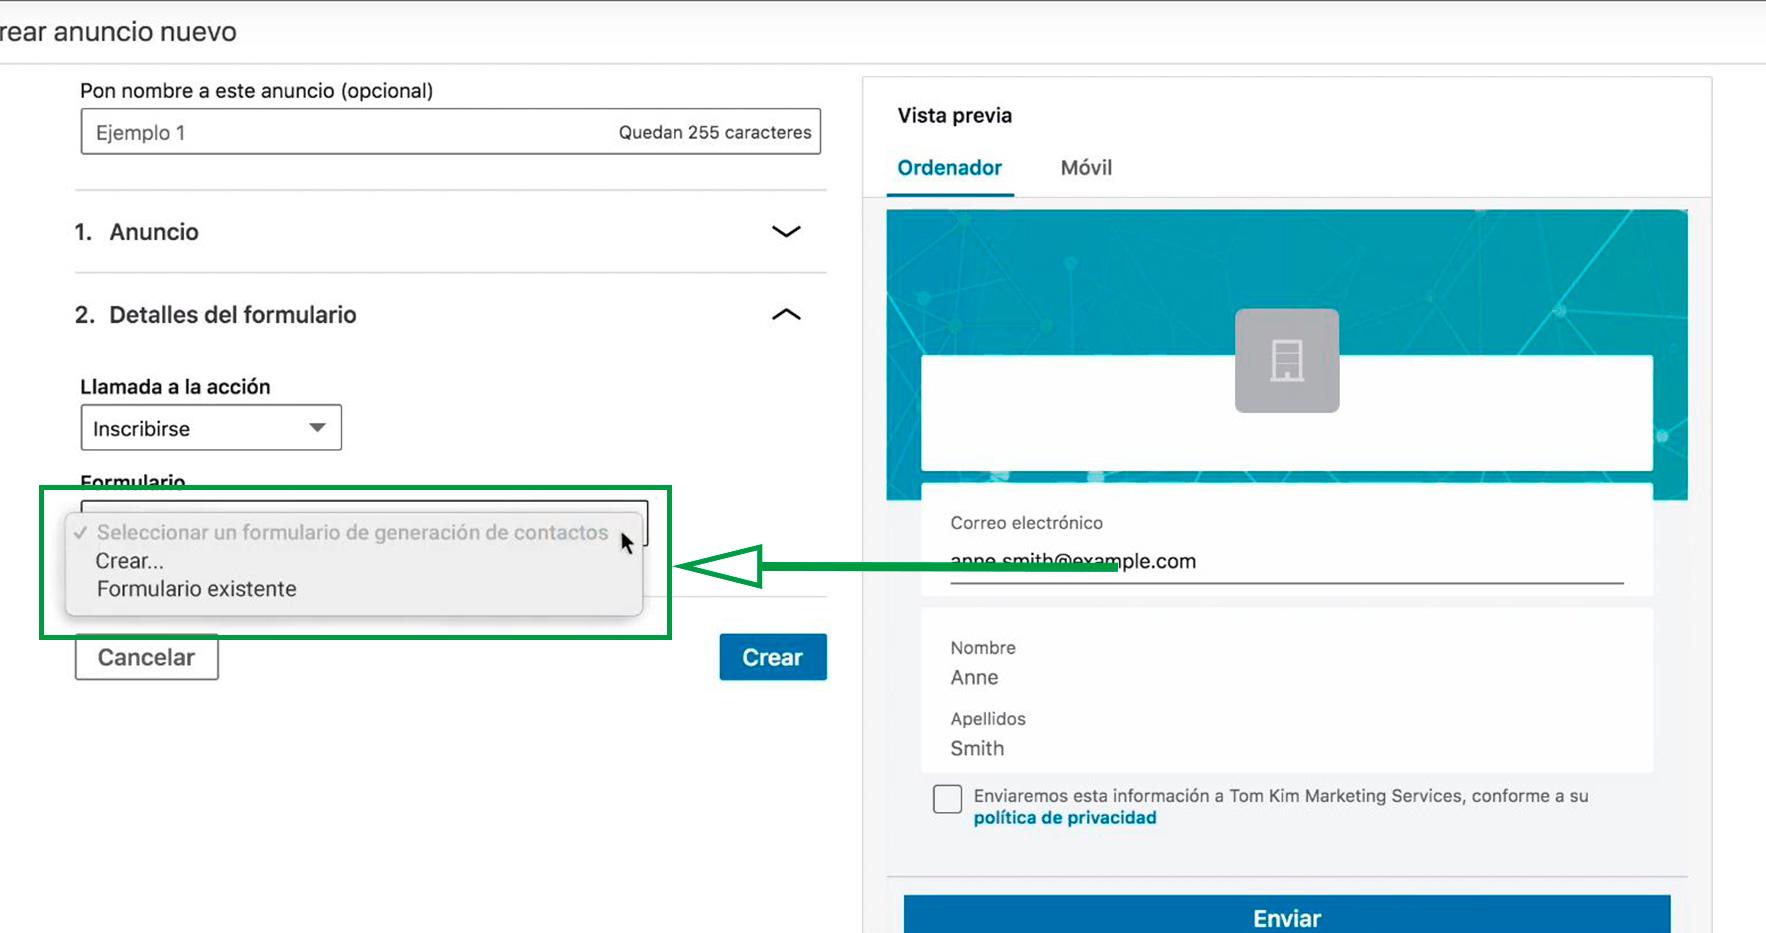 Cómo Usar Linkedin para captar clientes. Crear formulario